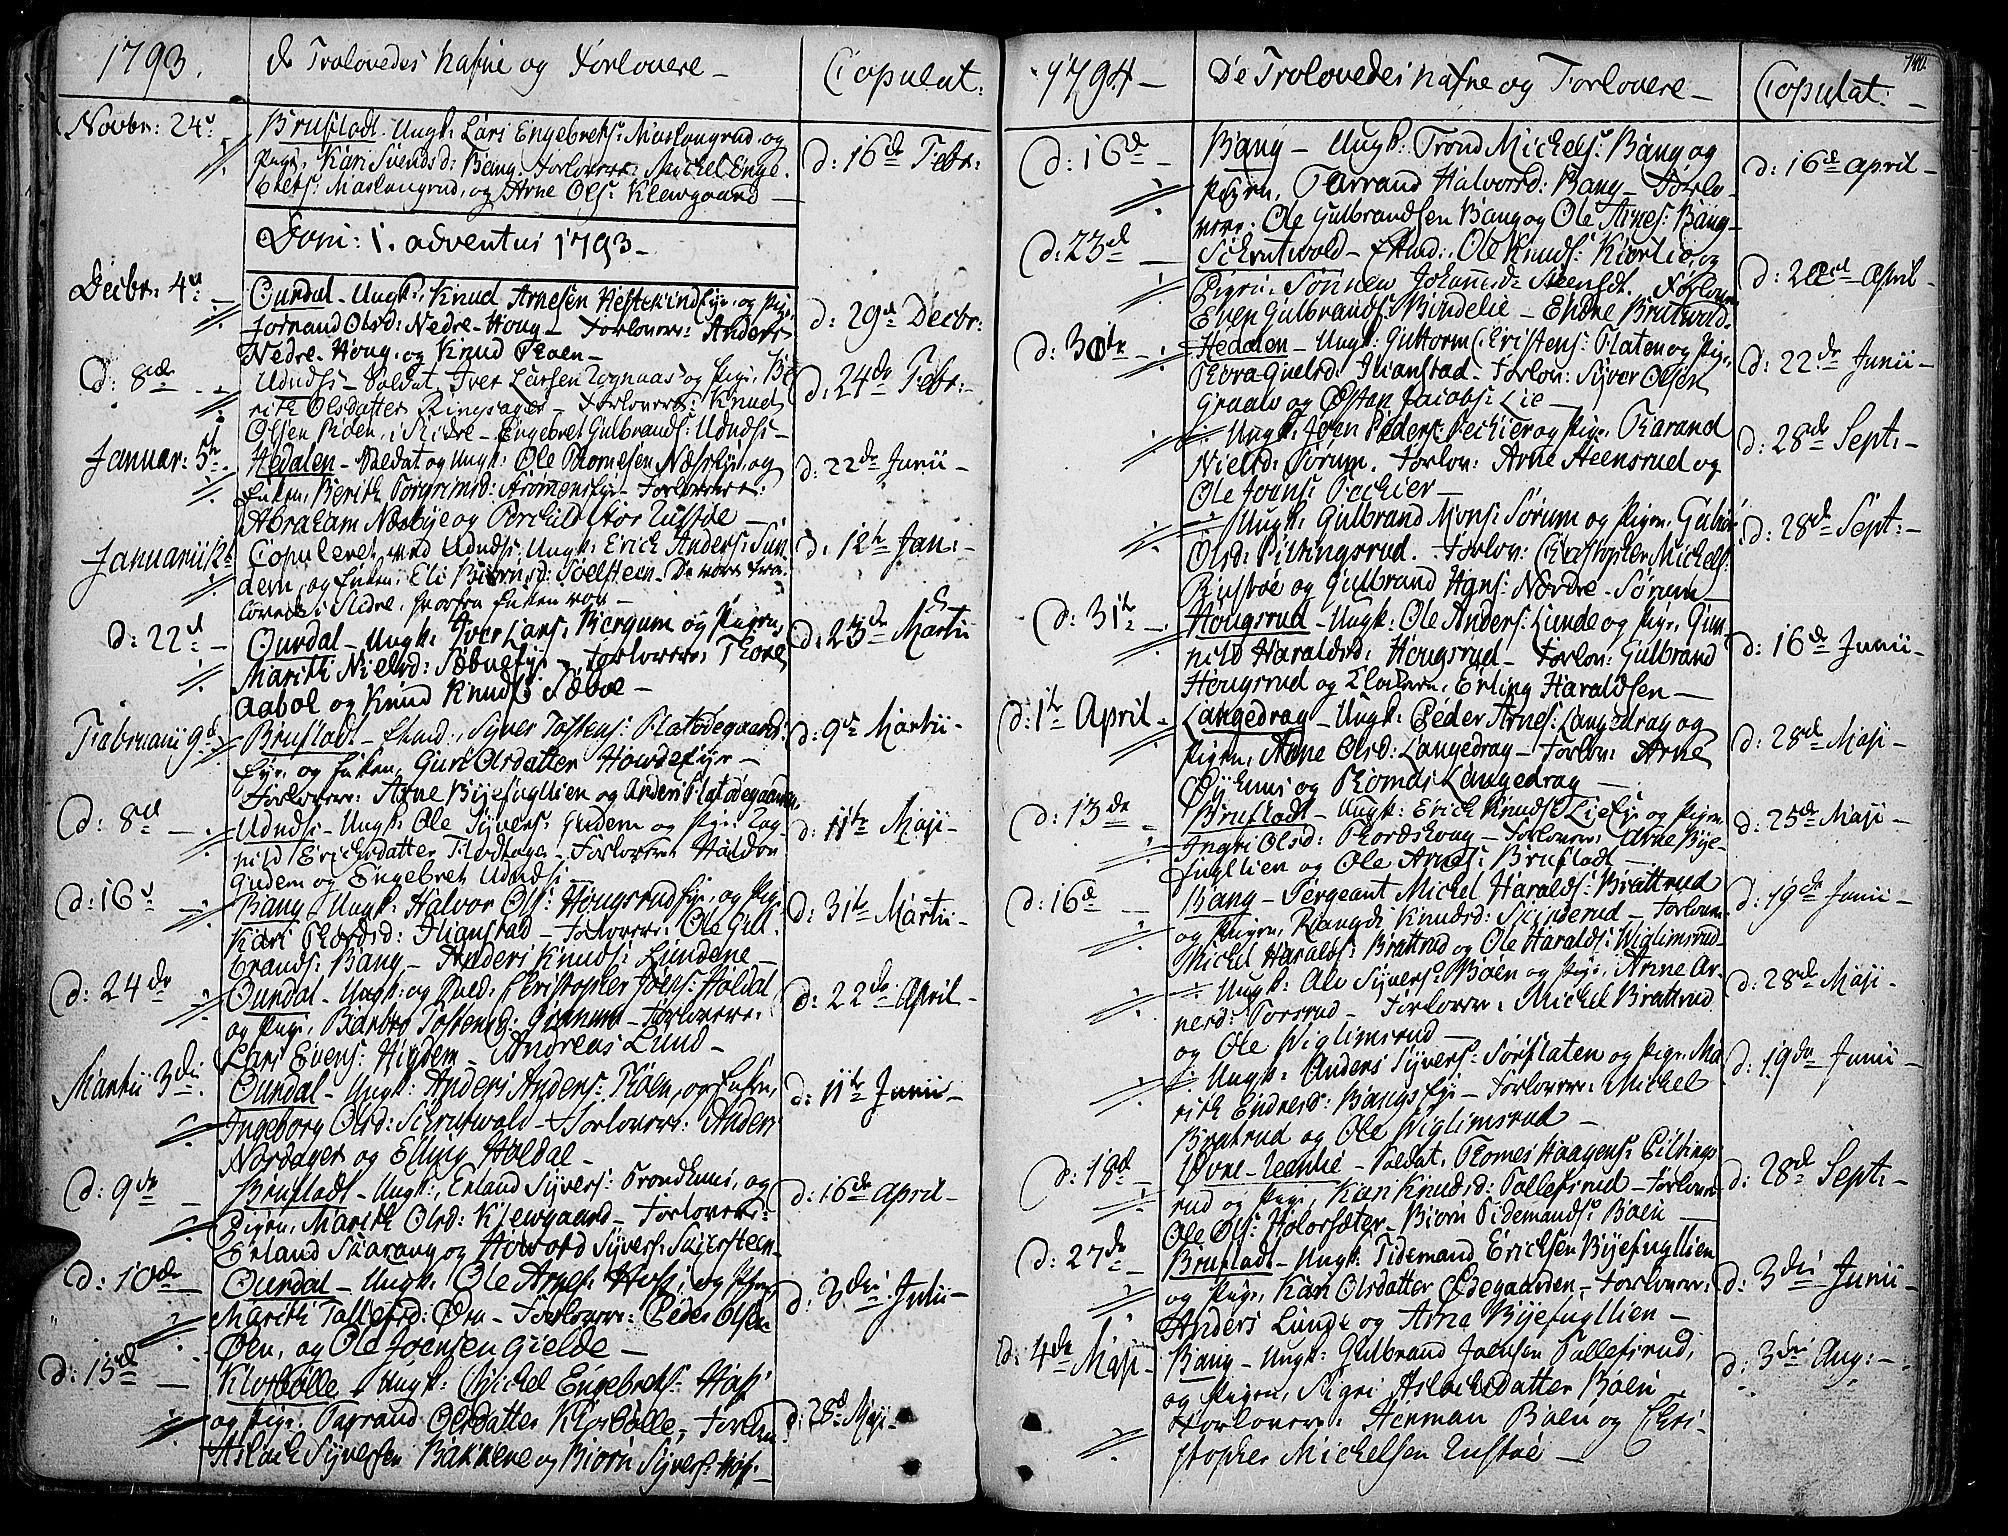 SAH, Aurdal prestekontor, Ministerialbok nr. 6, 1781-1804, s. 140